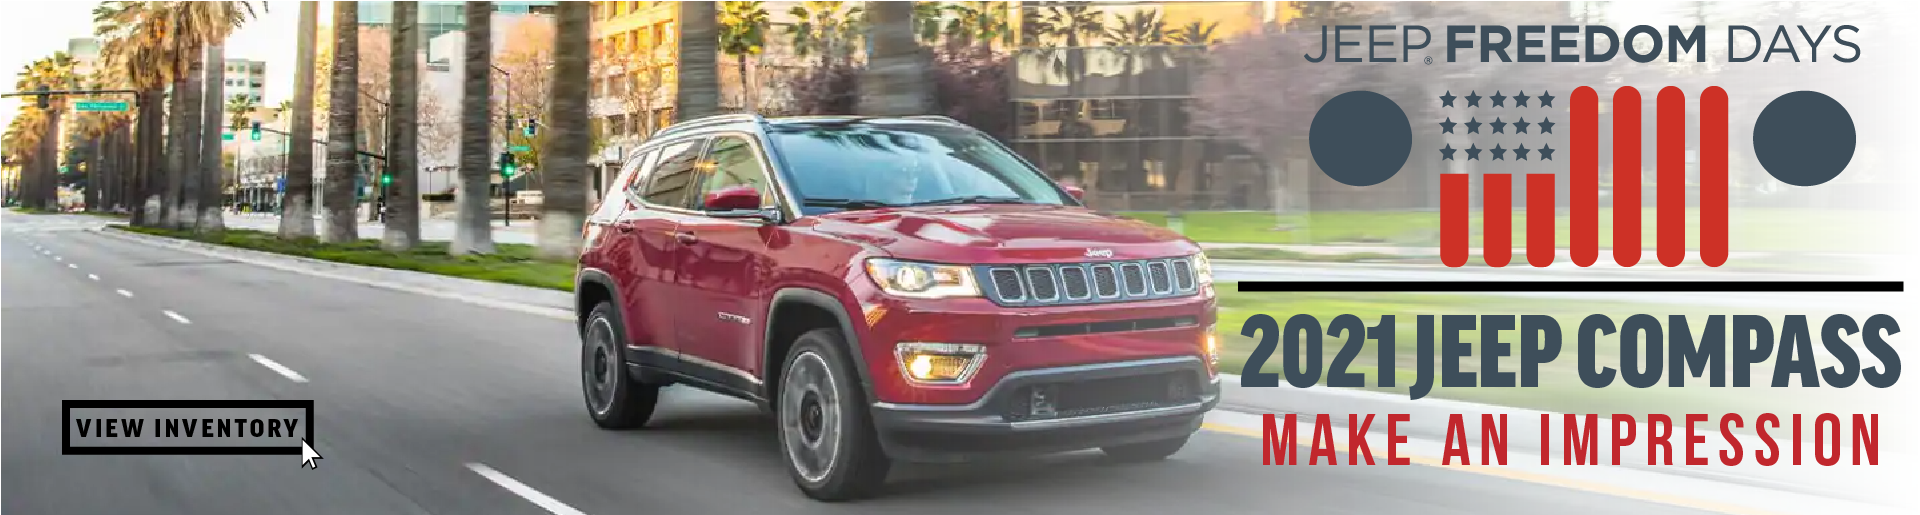 2021 Jeep Compass Generic- June 2021